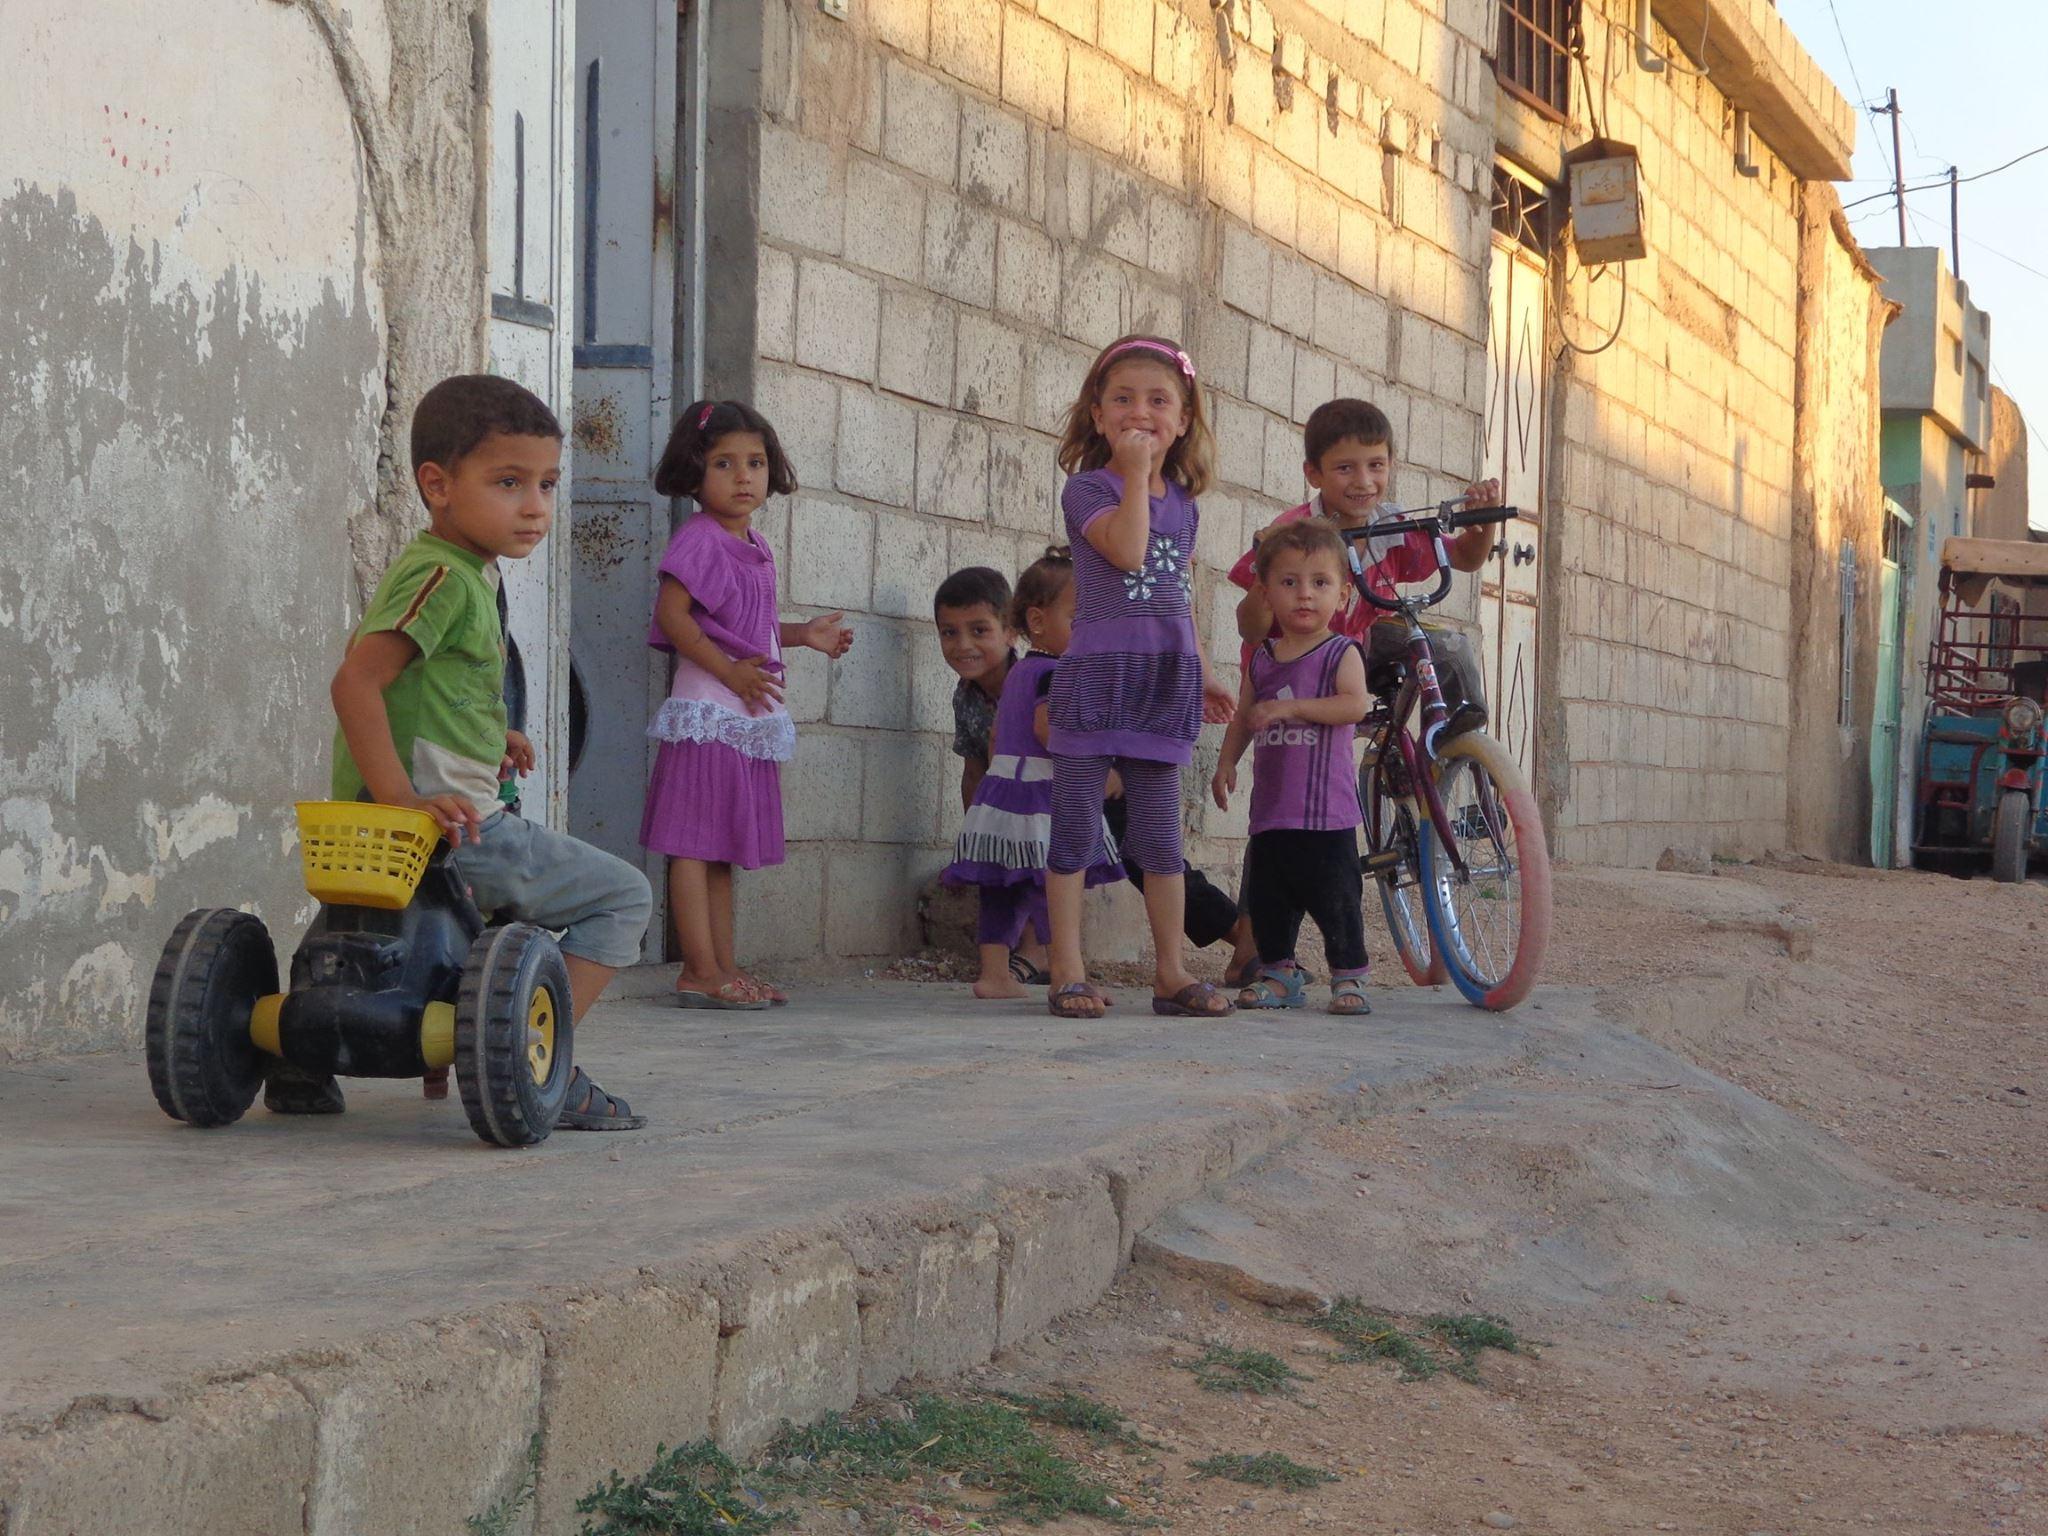 Syria, Rojava, Kurdistan, Kobane, Kobani